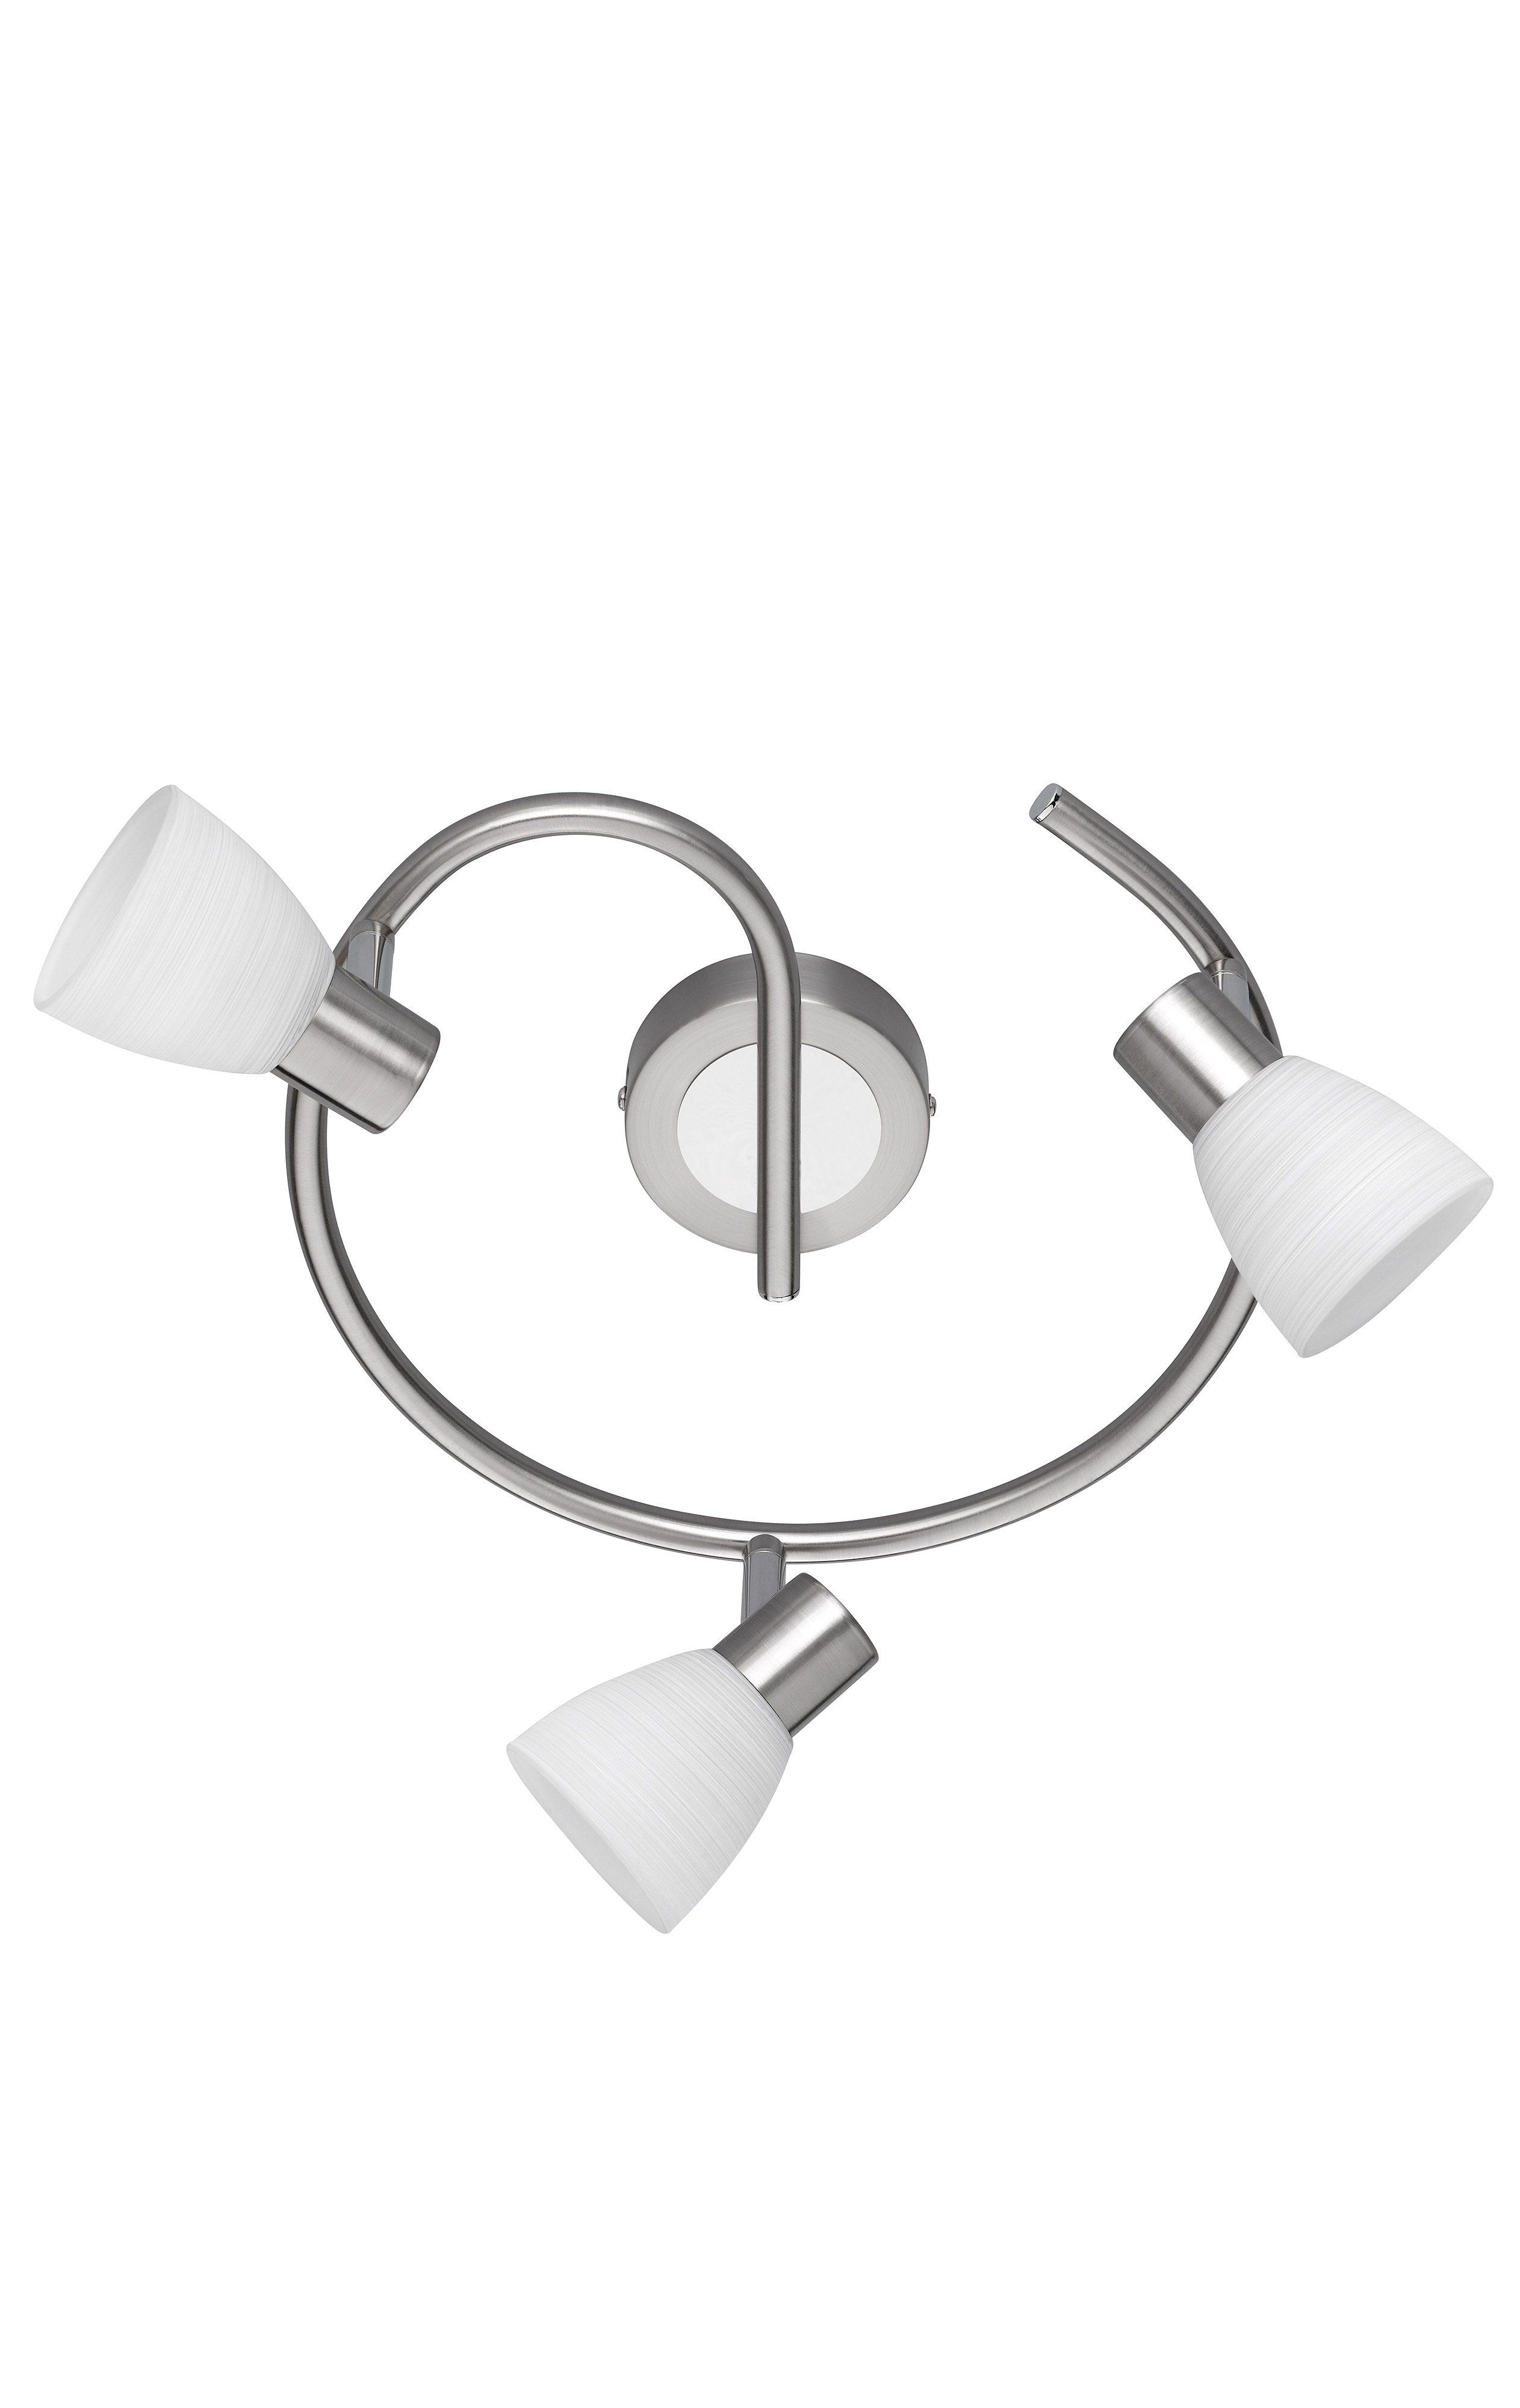 Trio LED-Deckenleuchte, 3flg., »CARICO«